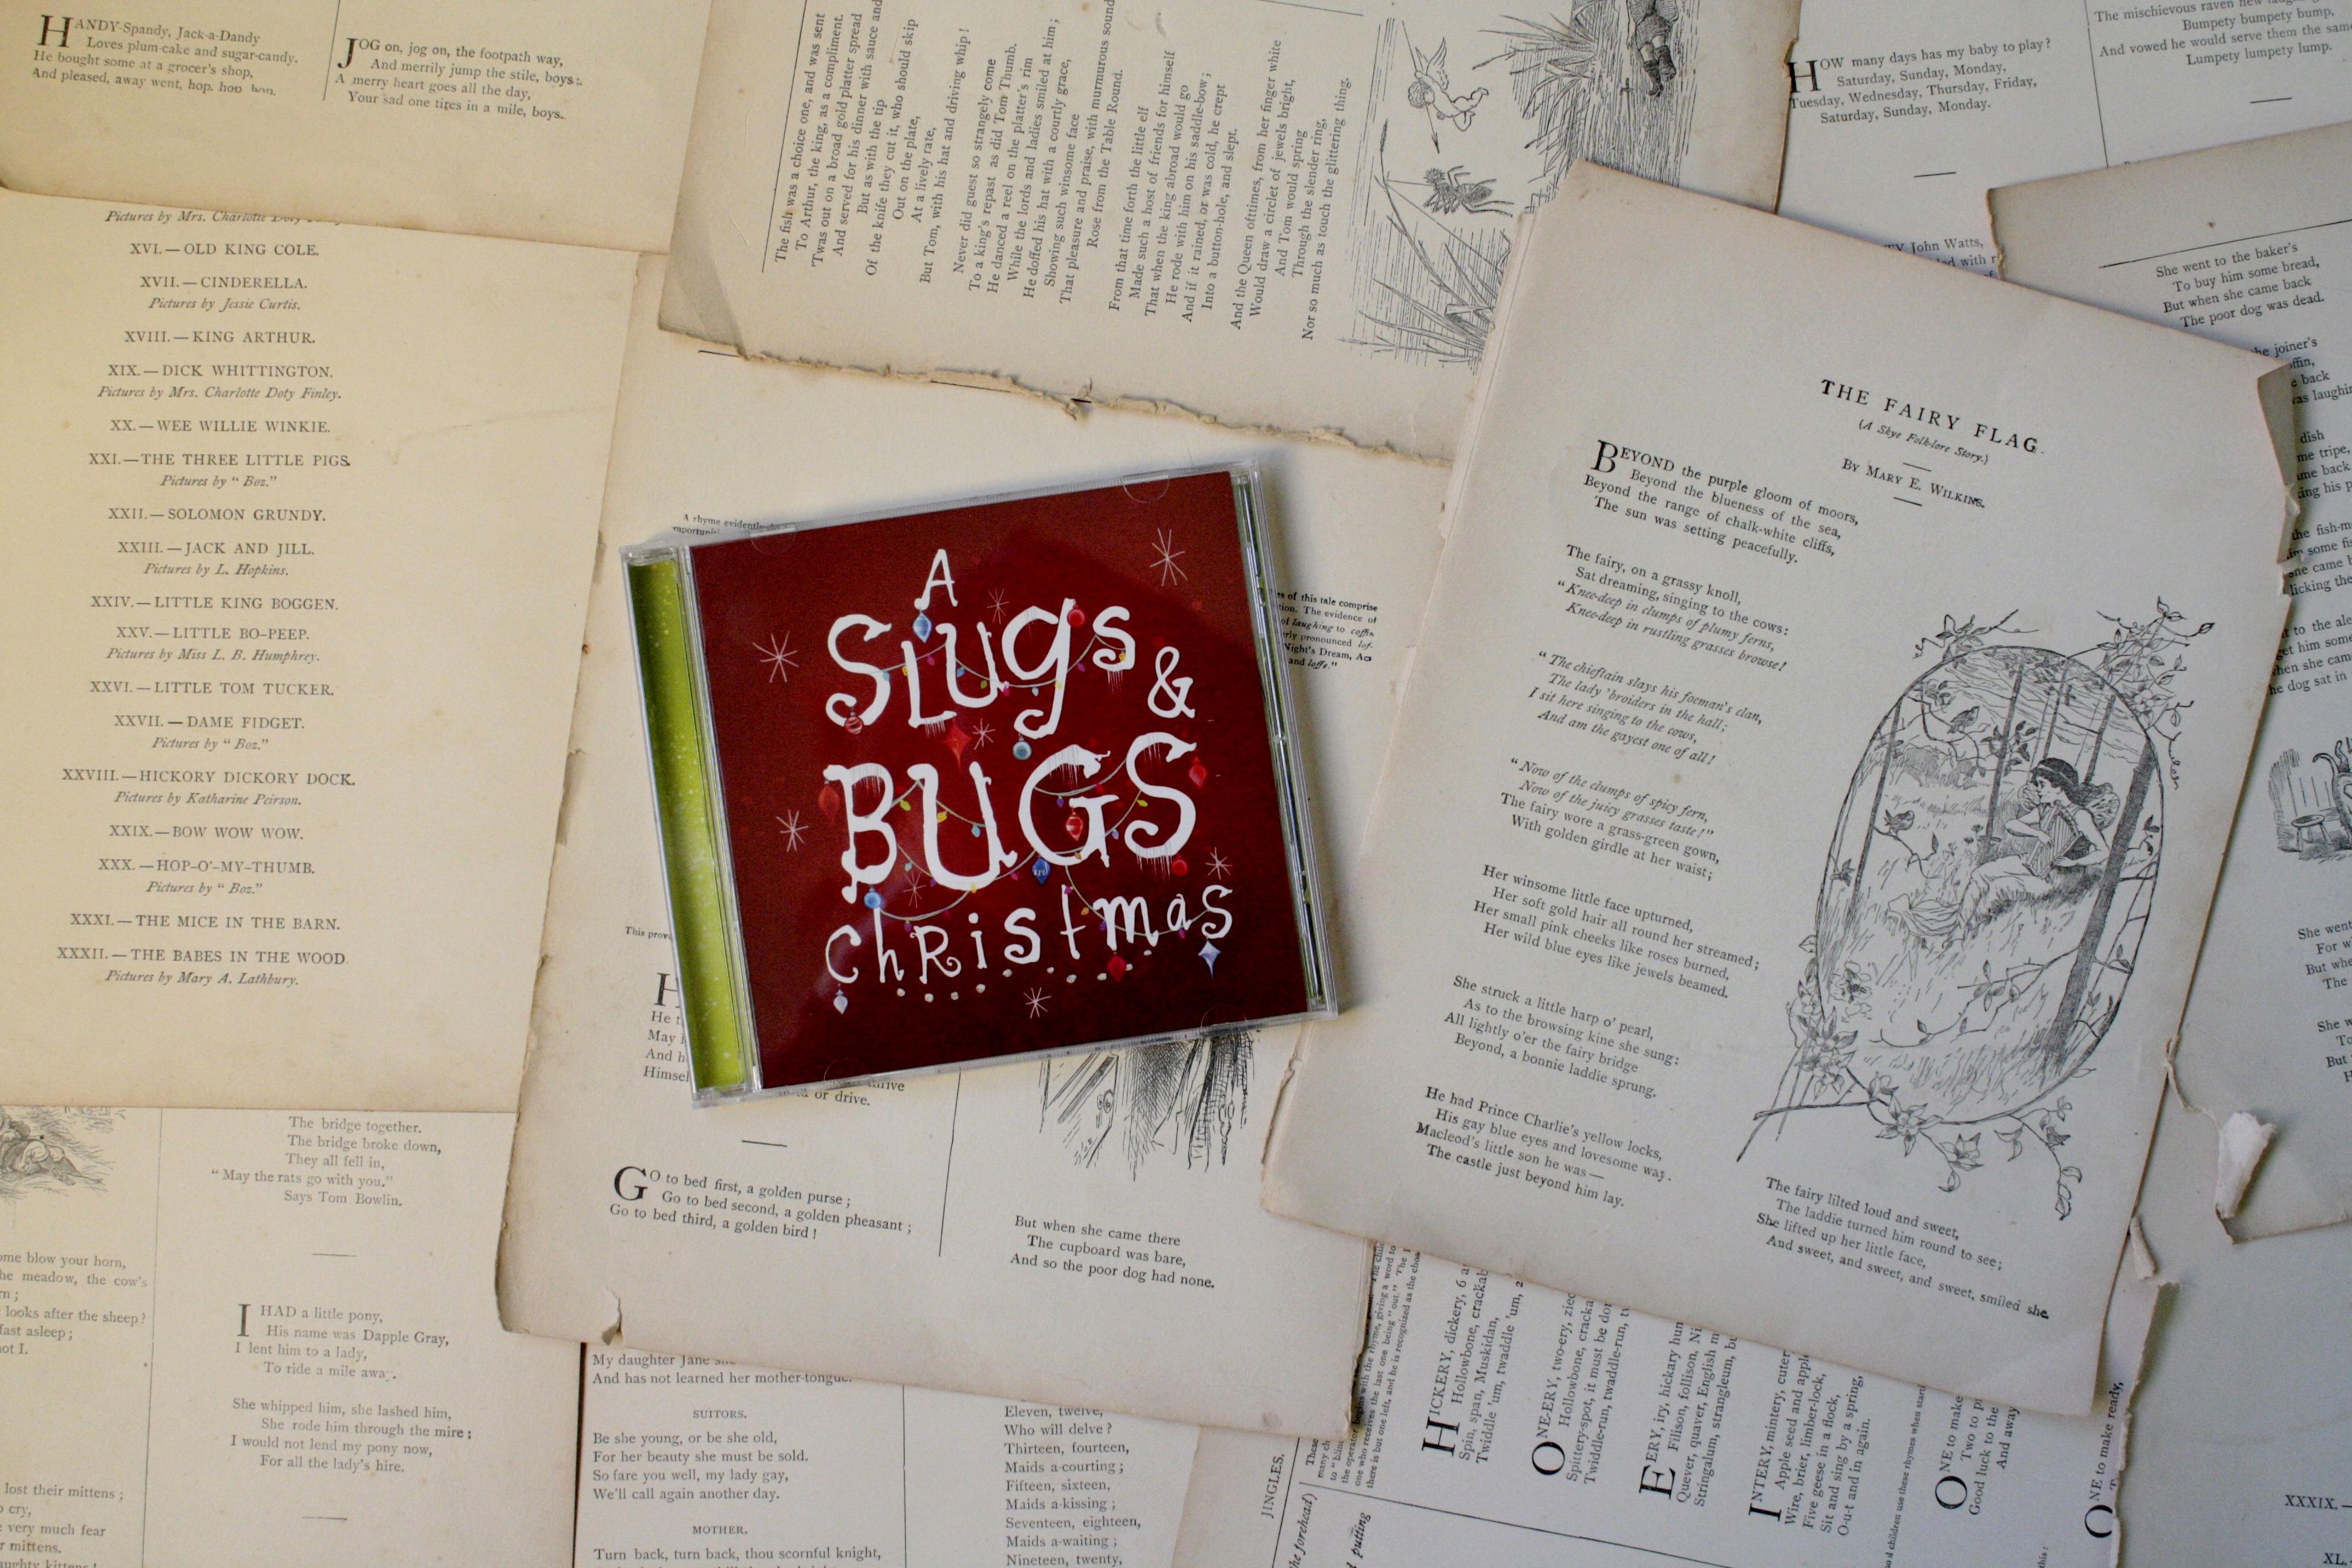 Slugs & Bugs | A Slugs & Bugs Christmas